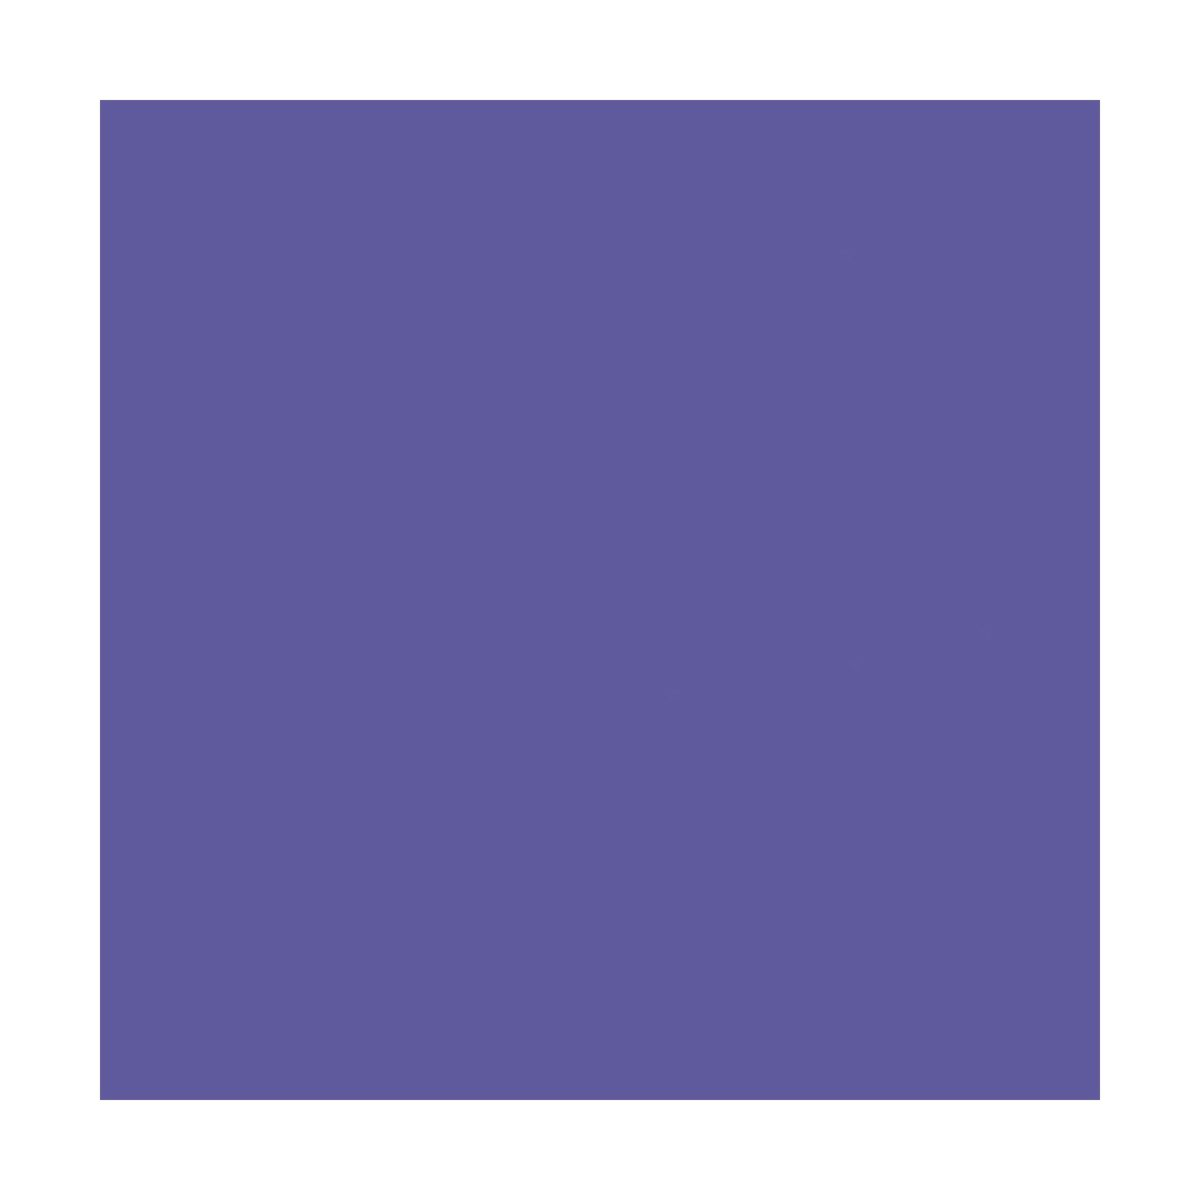 bd_backgrounds_154_purple_02